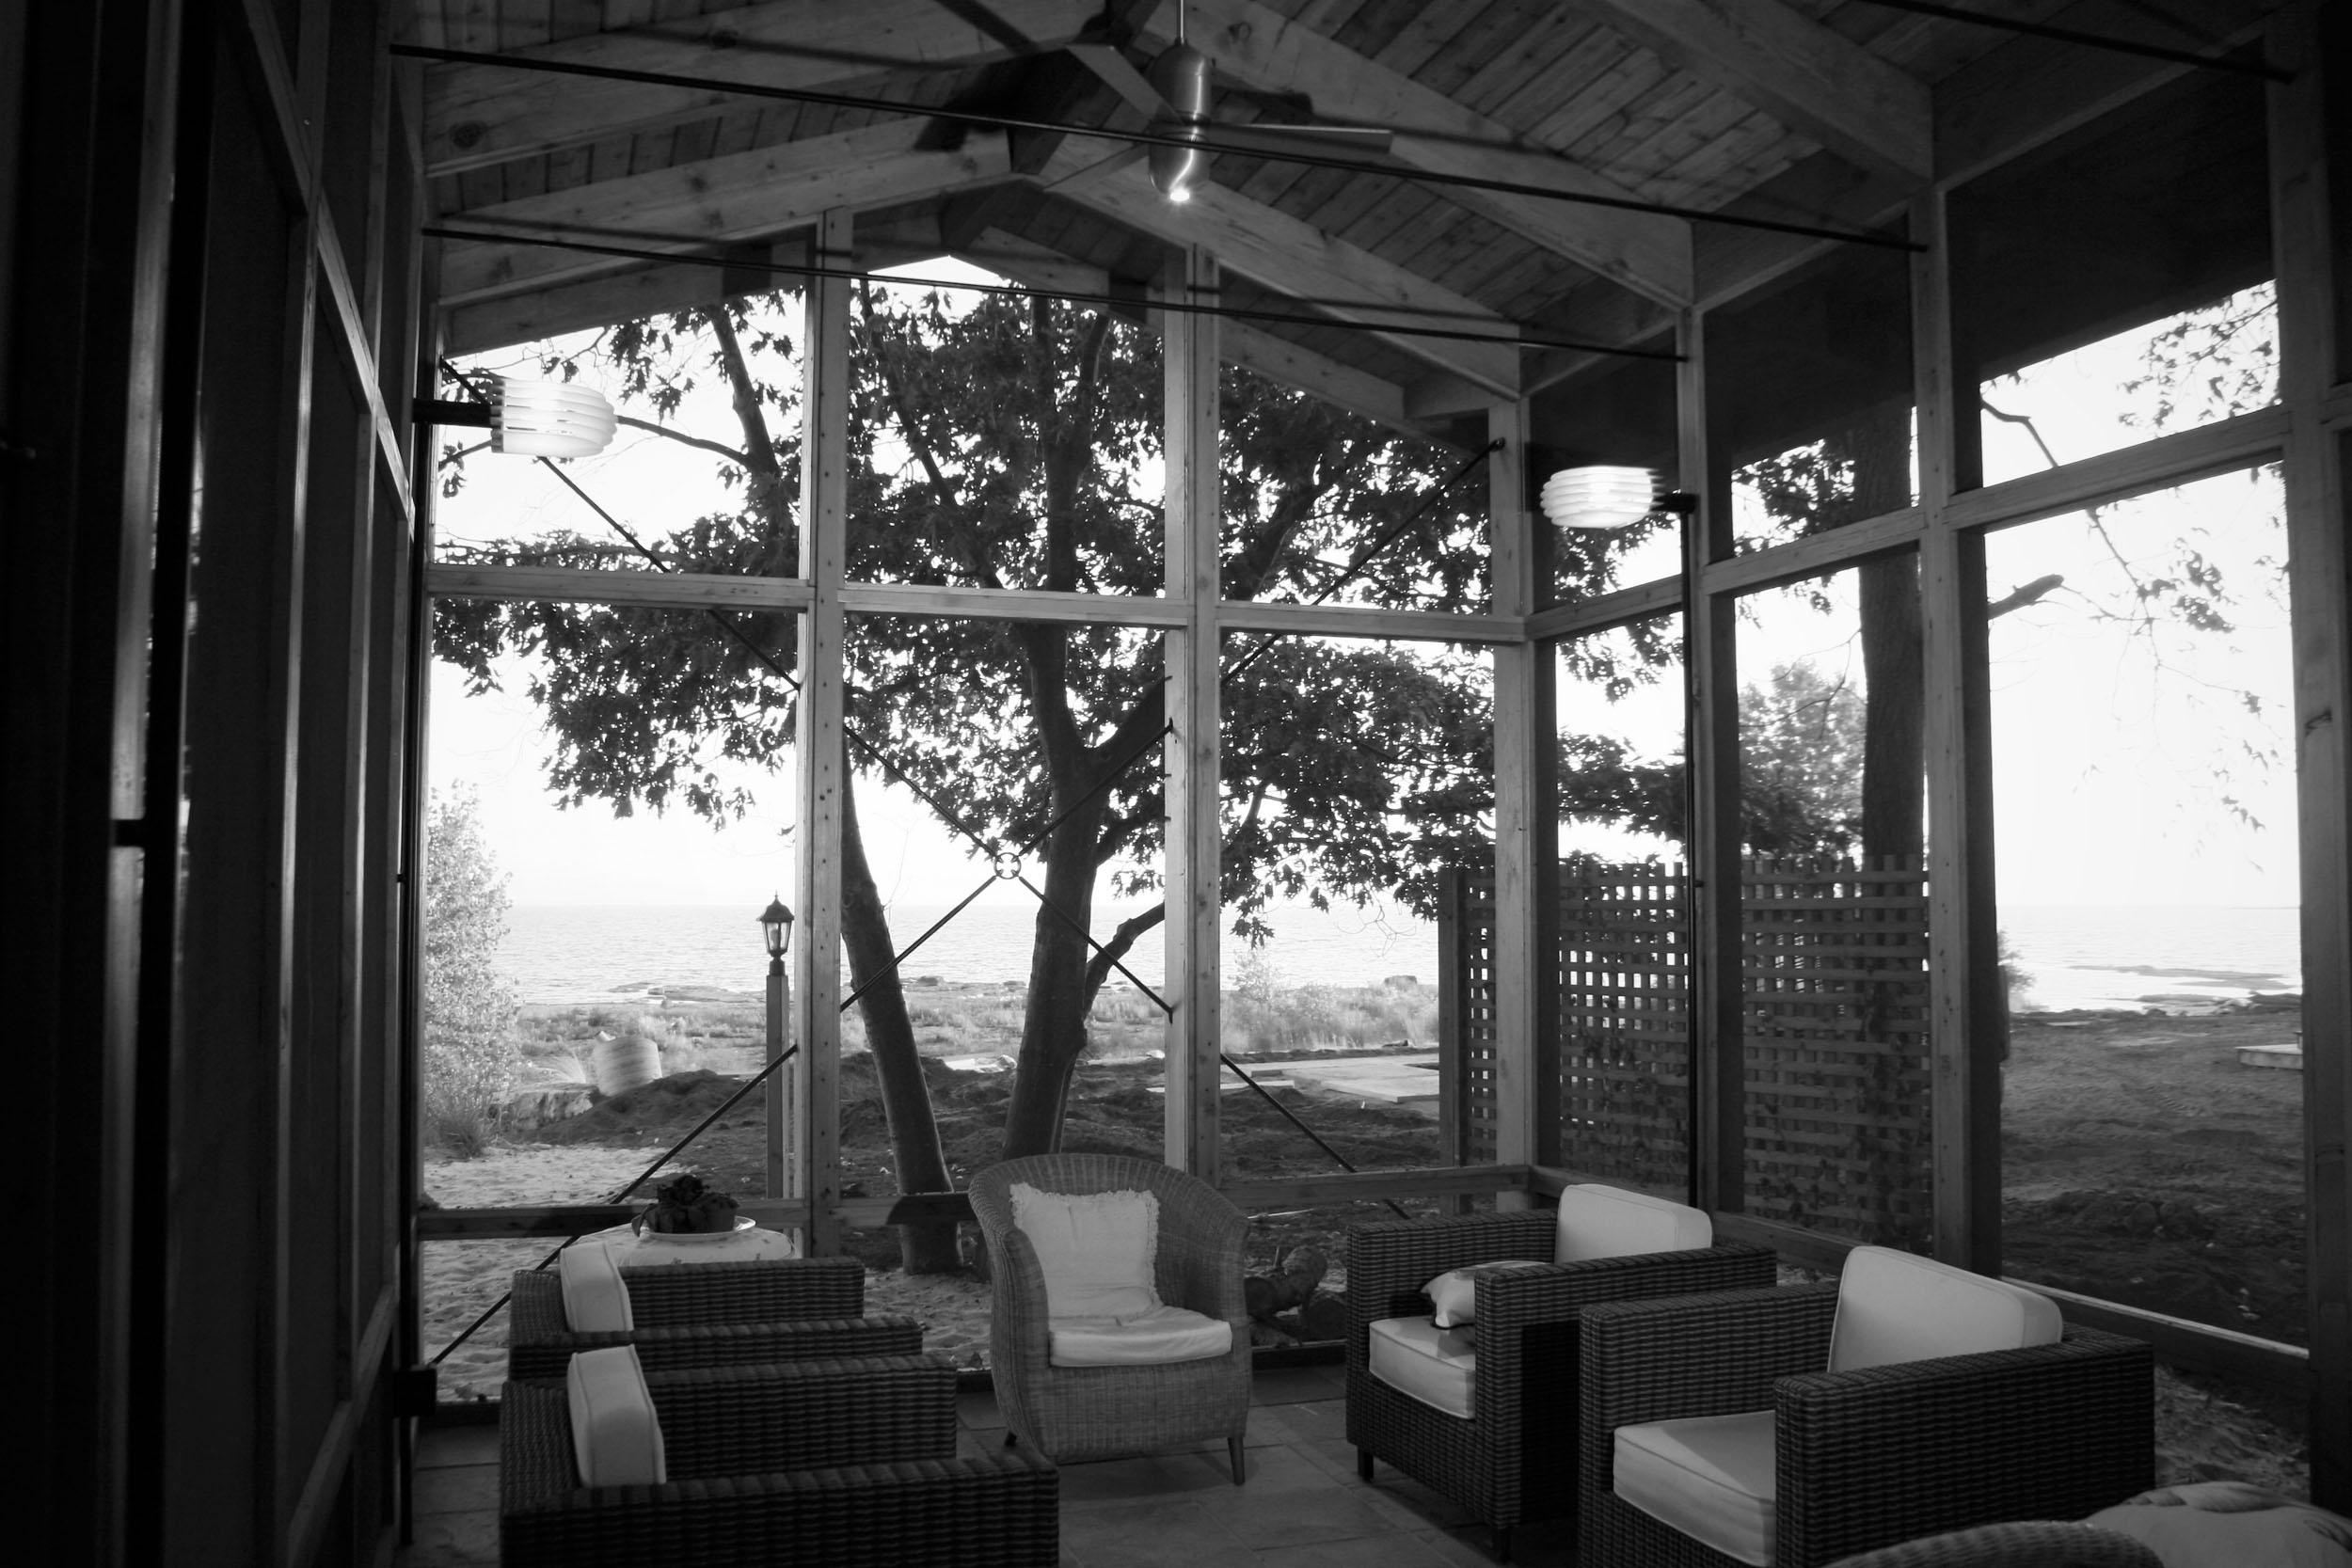 Collesano Beach House - Winner - AIA Buffalo-WNY - Citation Award 2007Published - Buffalo Spree - March 2007